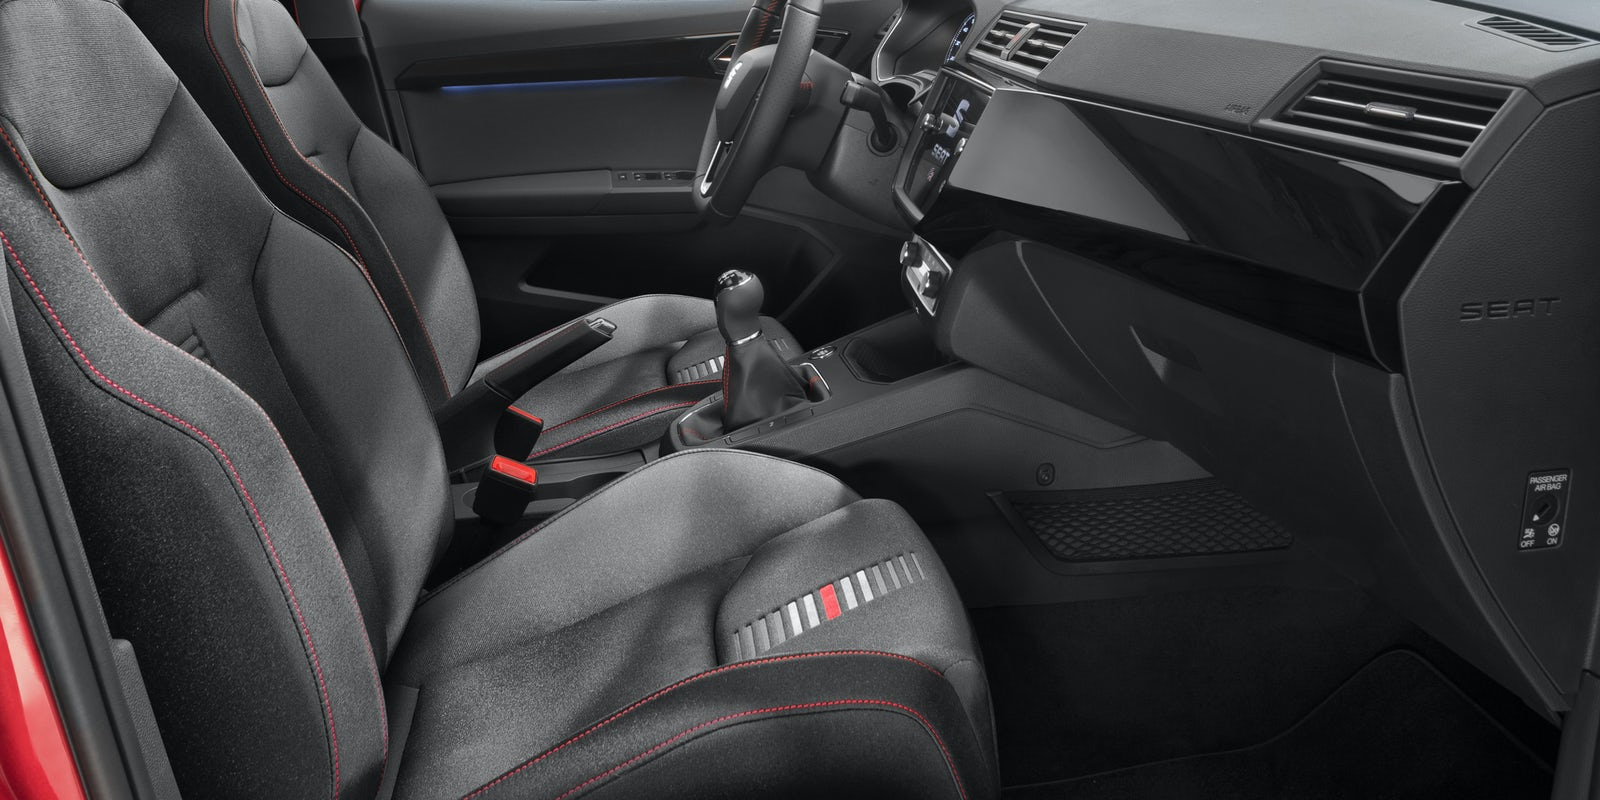 Seat ibiza 2017 review carwow for Interior ibiza 2017